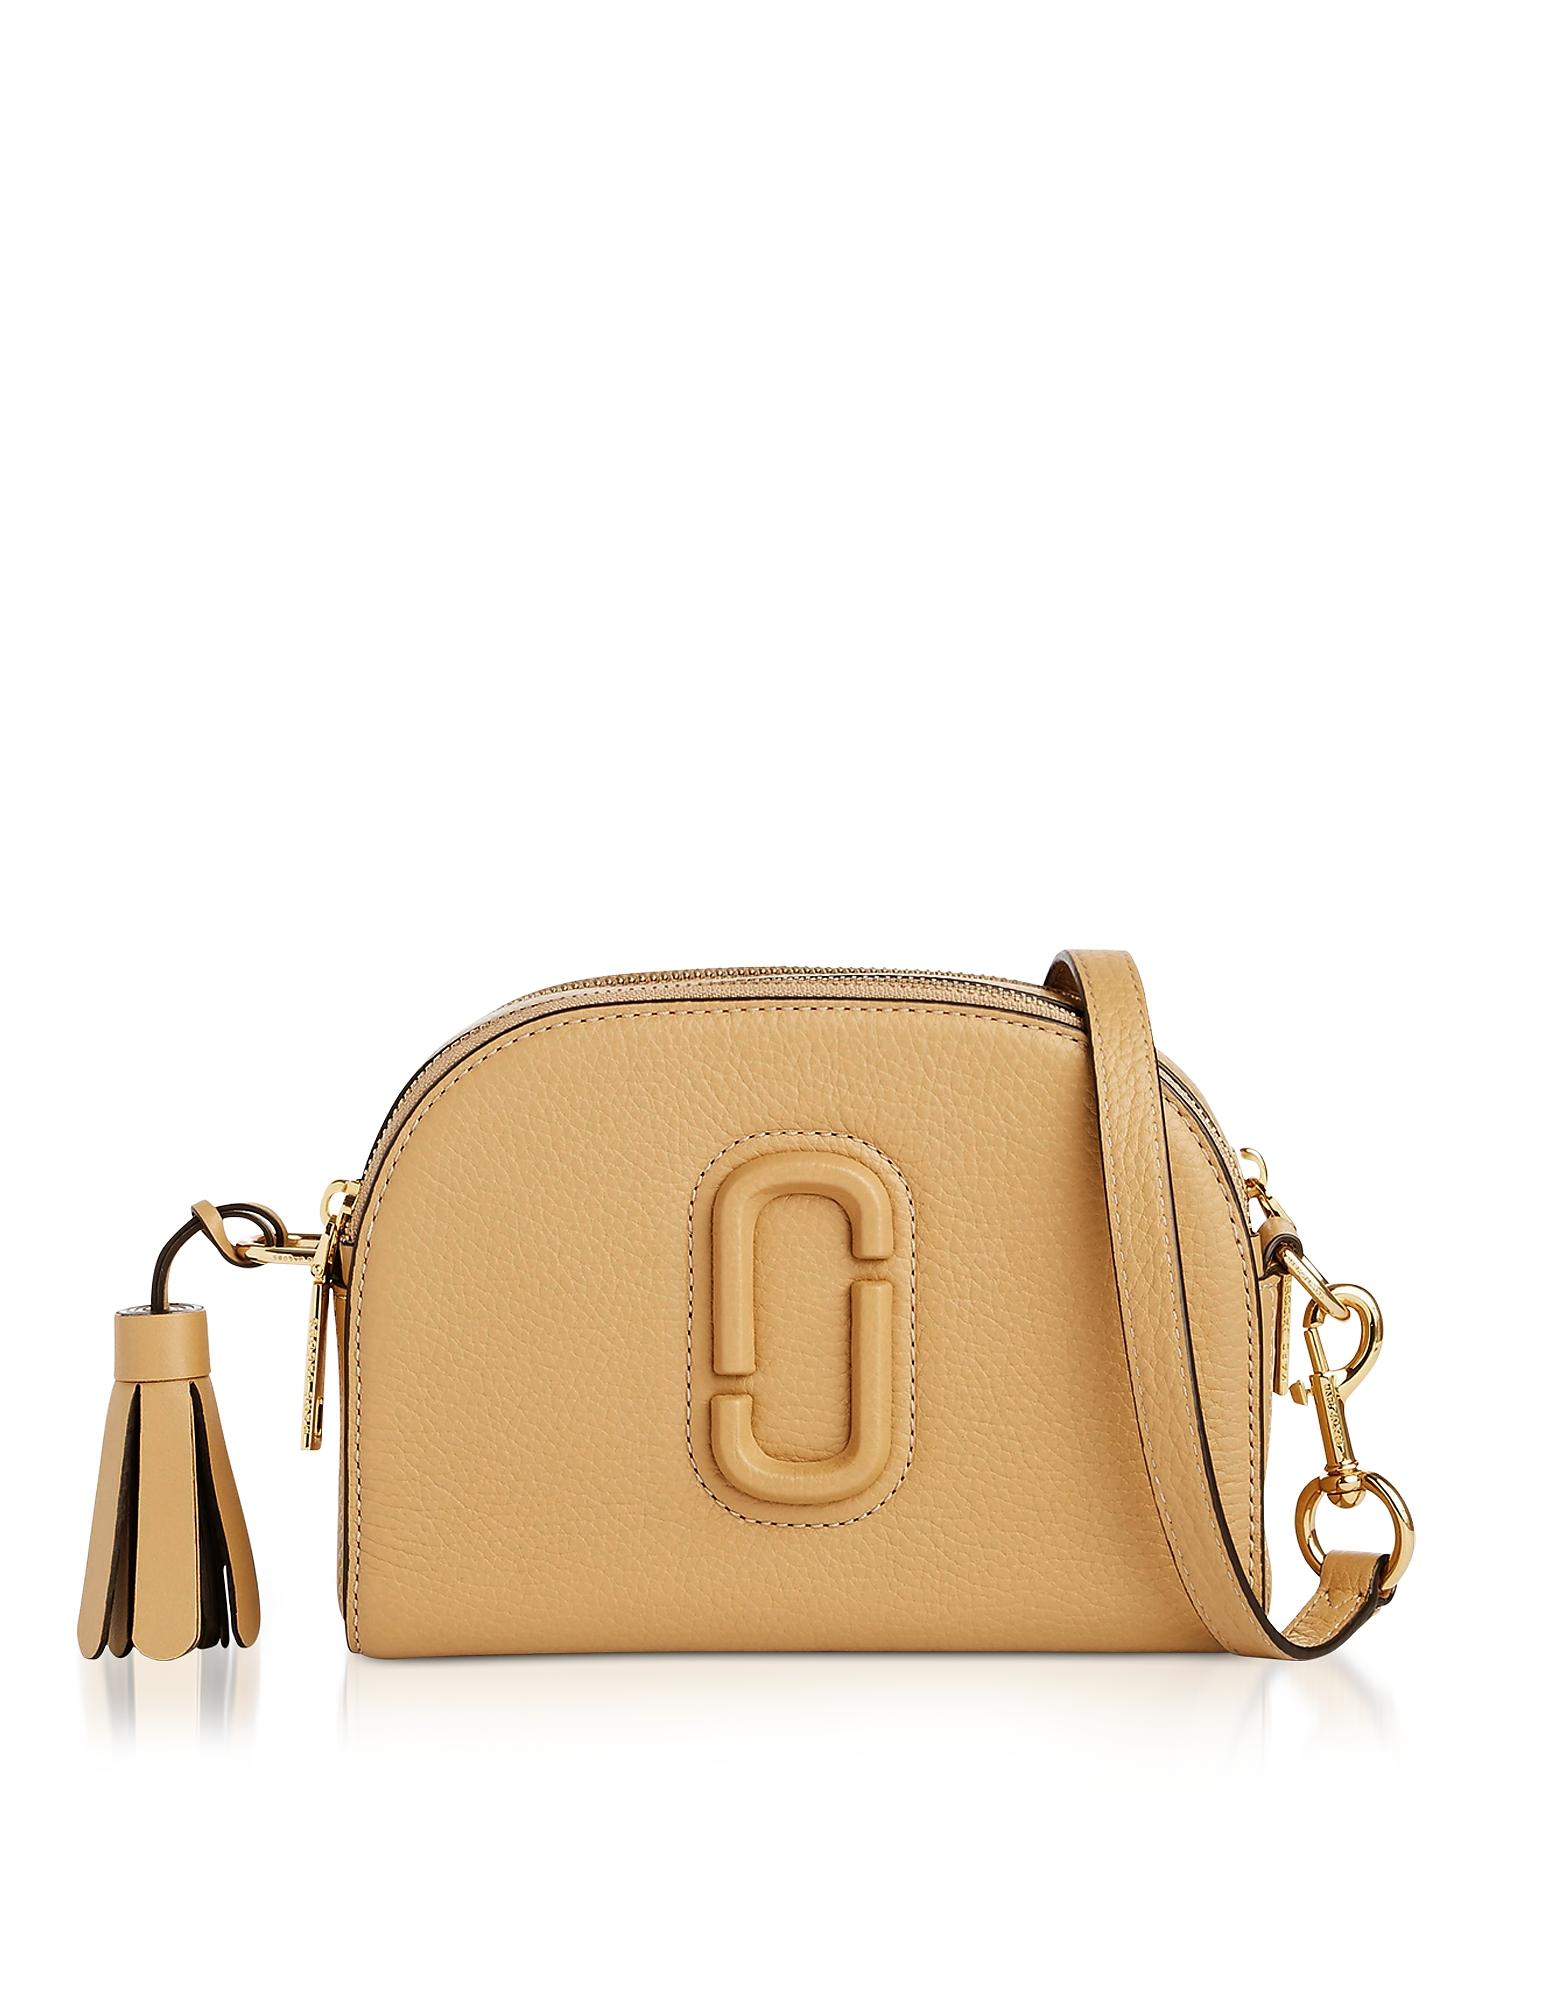 Marc Jacobs Handbags, Shutter Golden Beige Leather Small Camera Bag